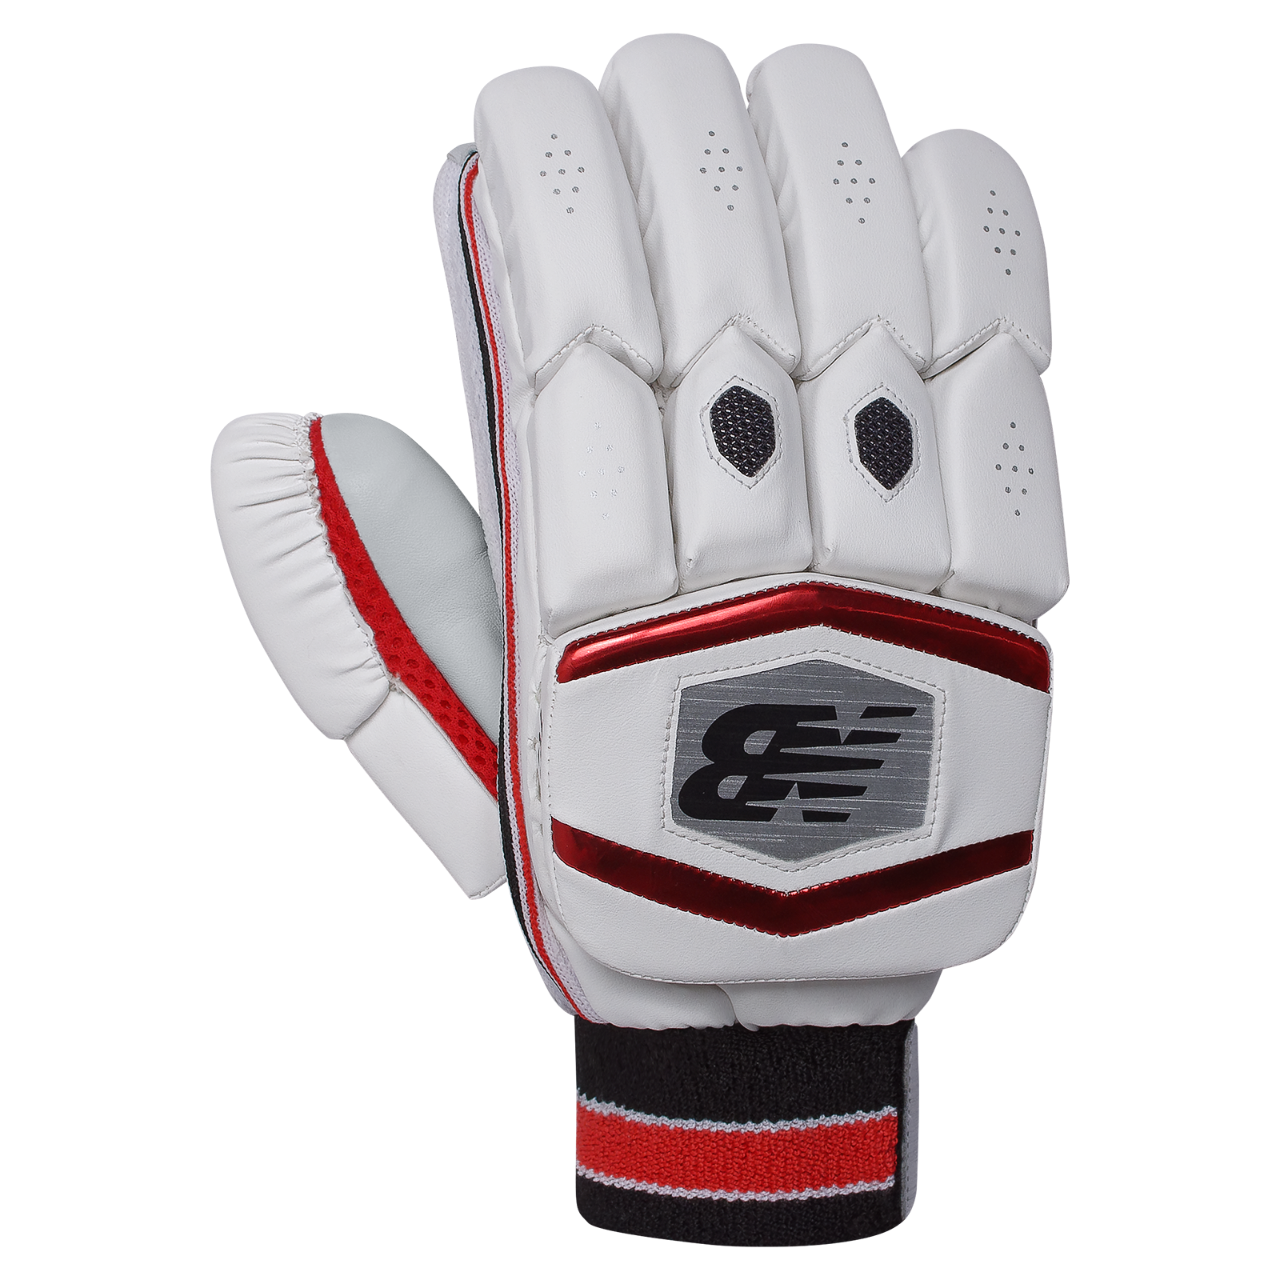 2021 New Balance TC 560 Junior Batting Gloves